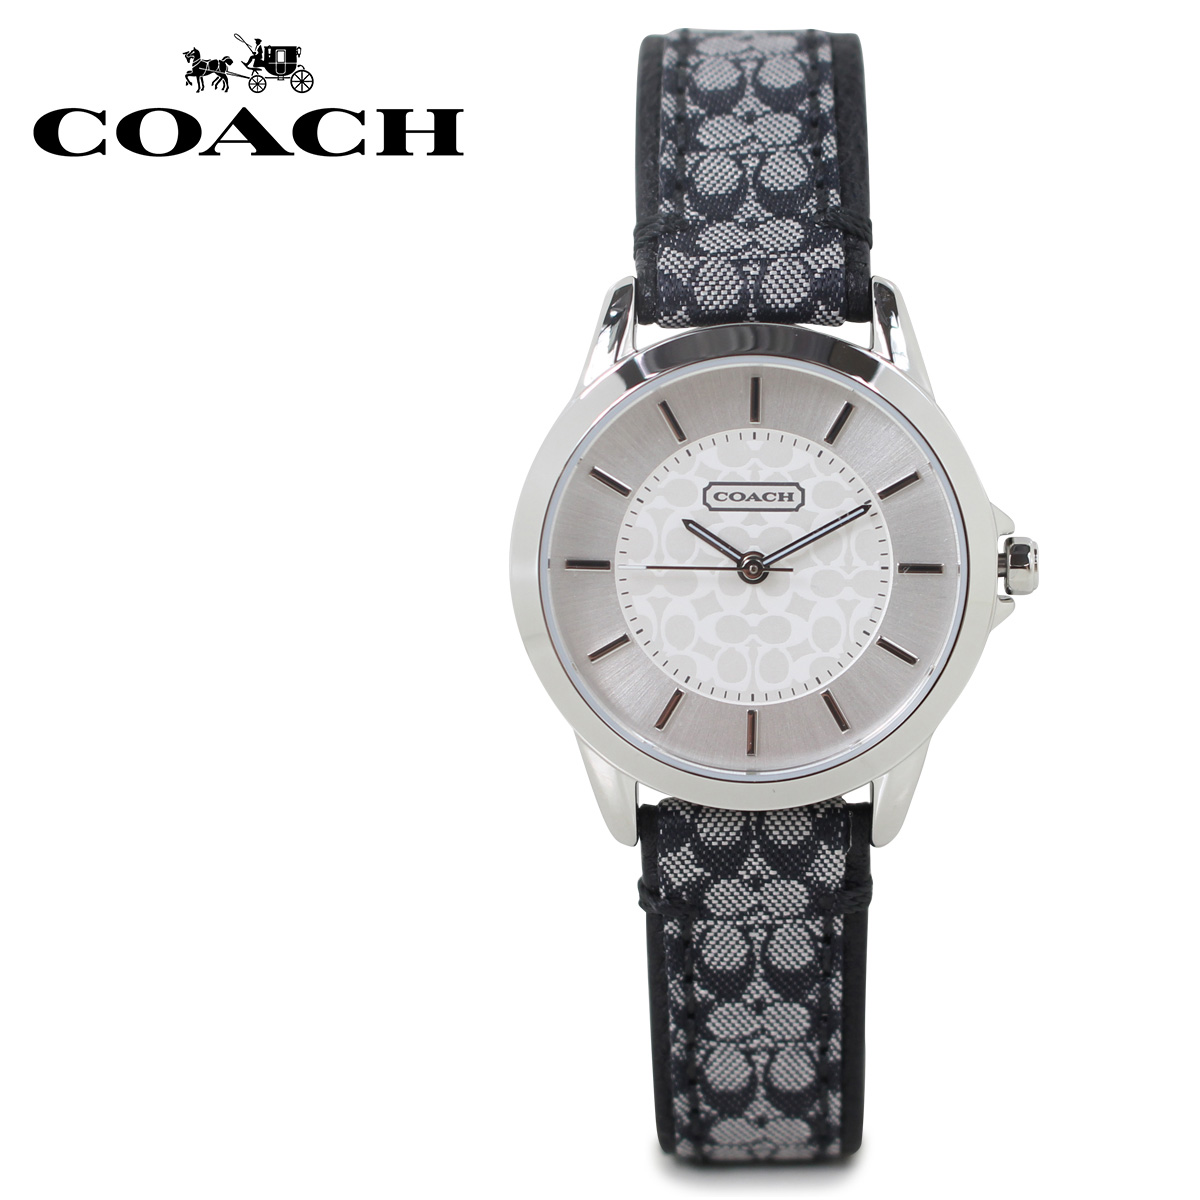 3f72656b467e COACH coach watch Lady s signature leather black 14501524  5 22 Shinnyu  load